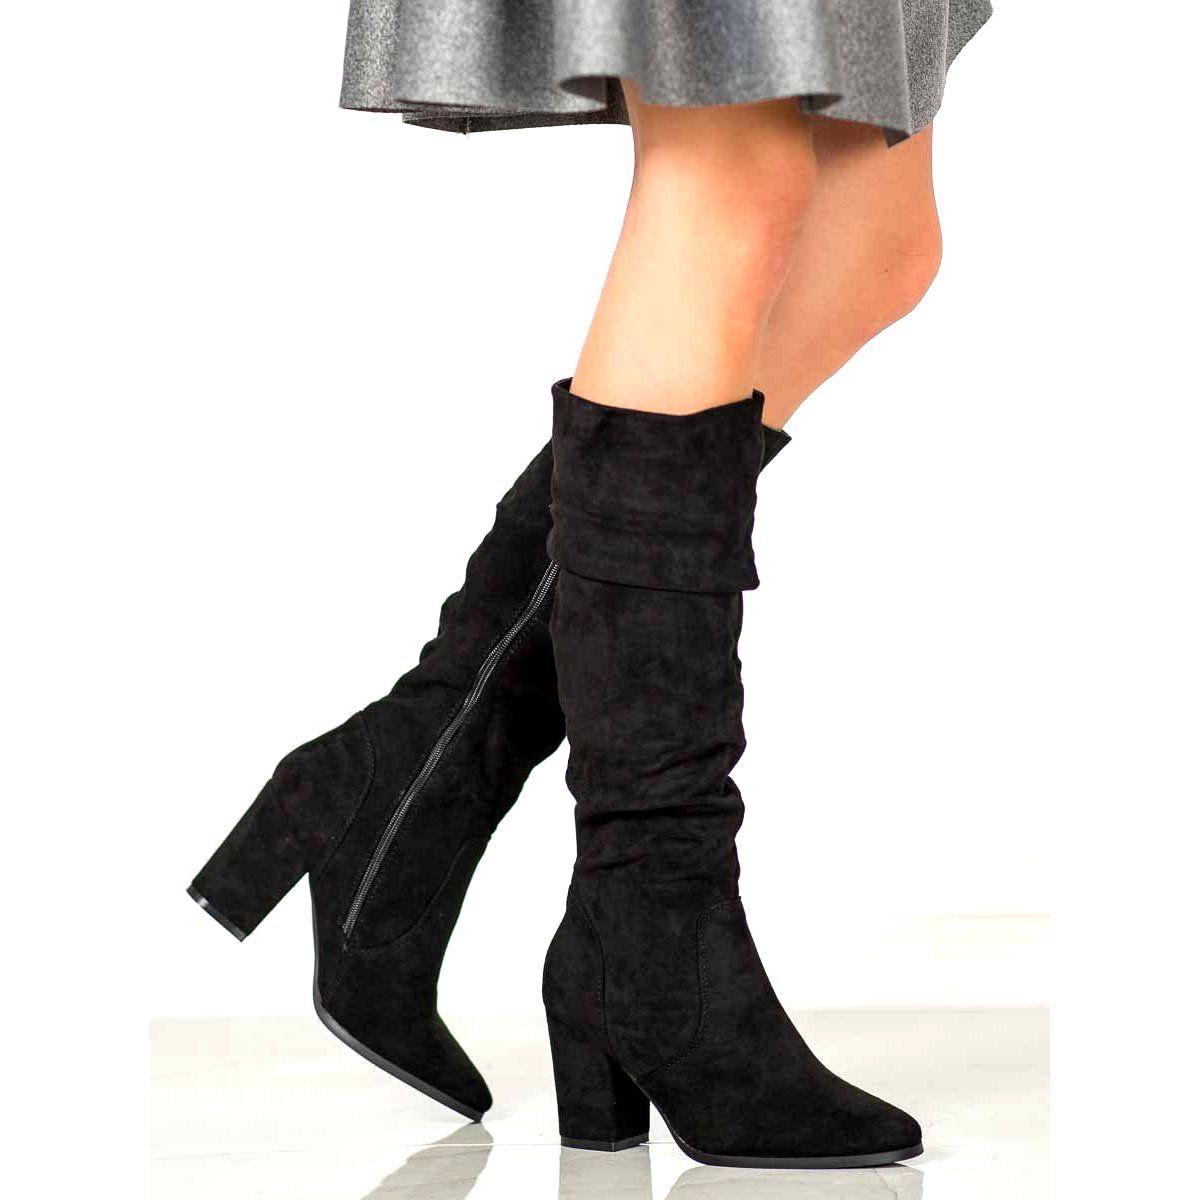 Shelovet Zamszowe Kozaki Na Obcasie Czarne Suede High Heels Heels Black High Heels